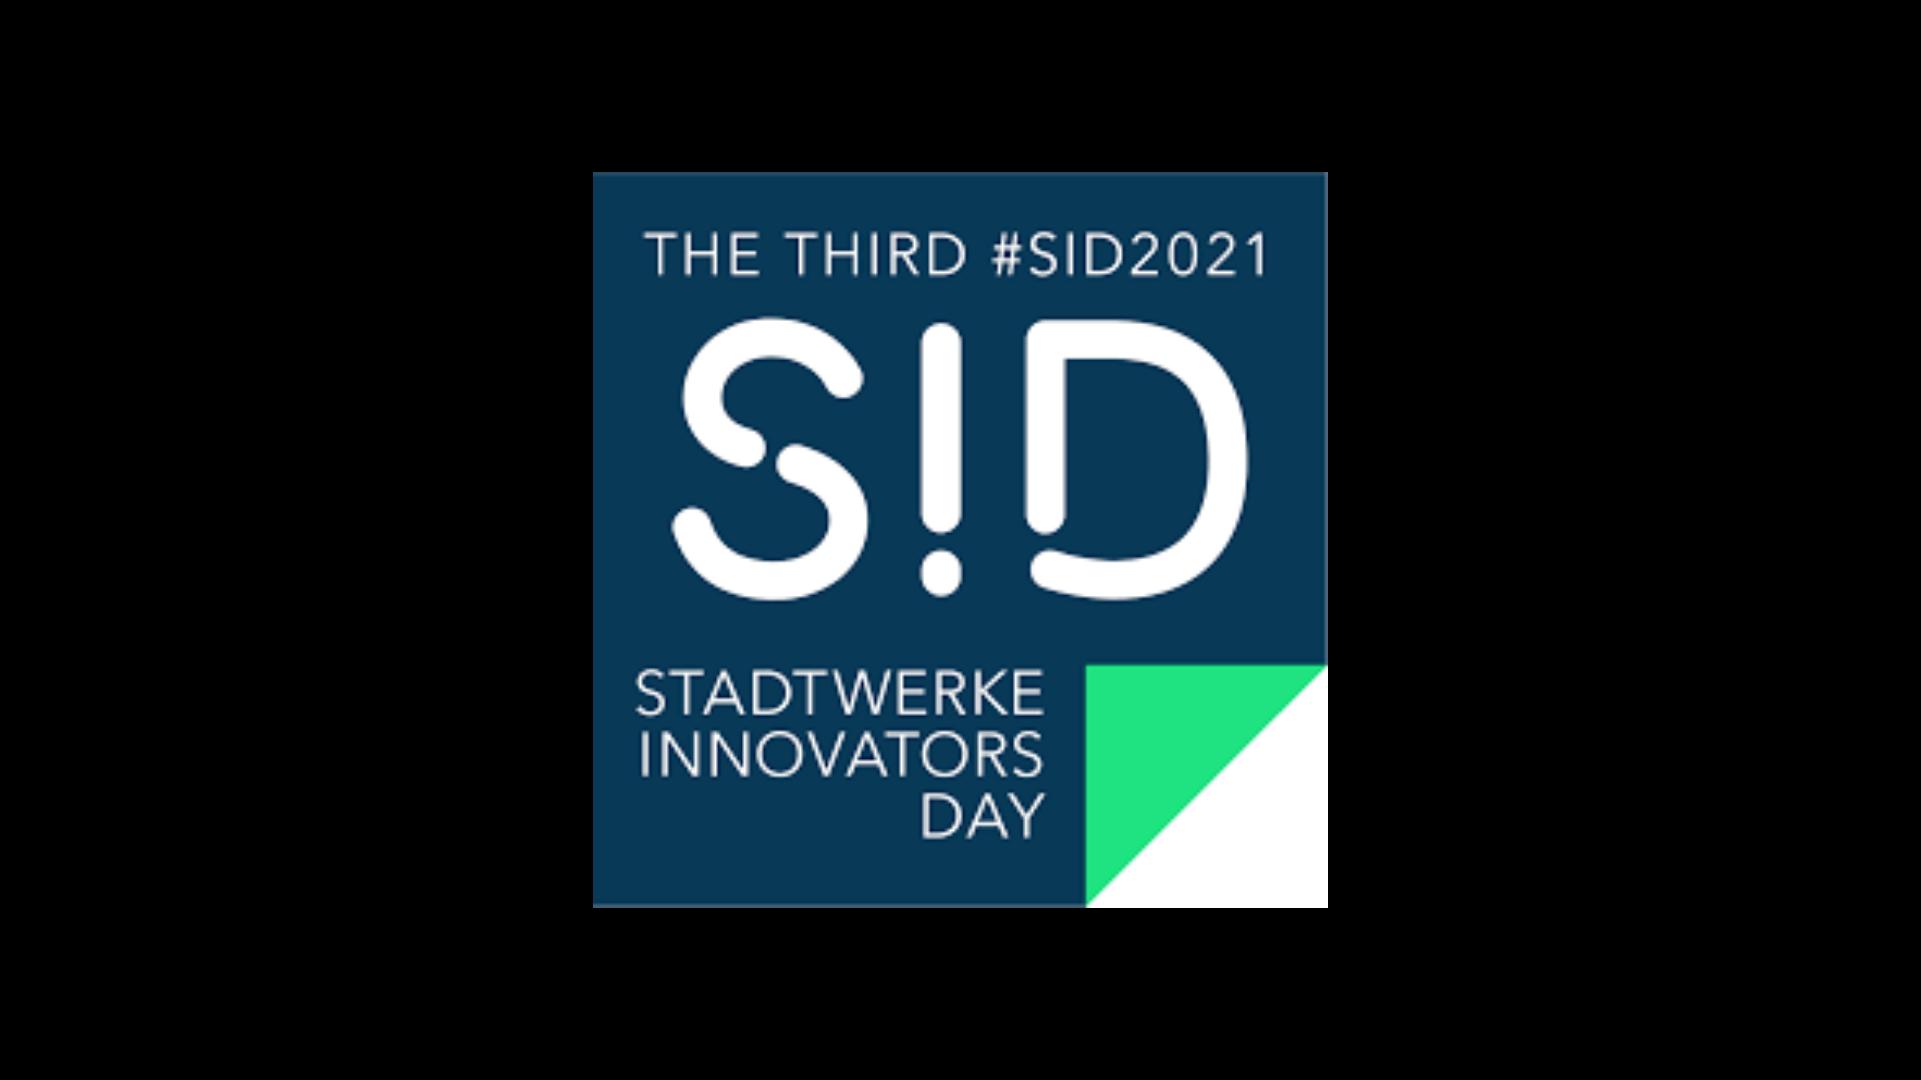 Stadtwerke Innovators Day